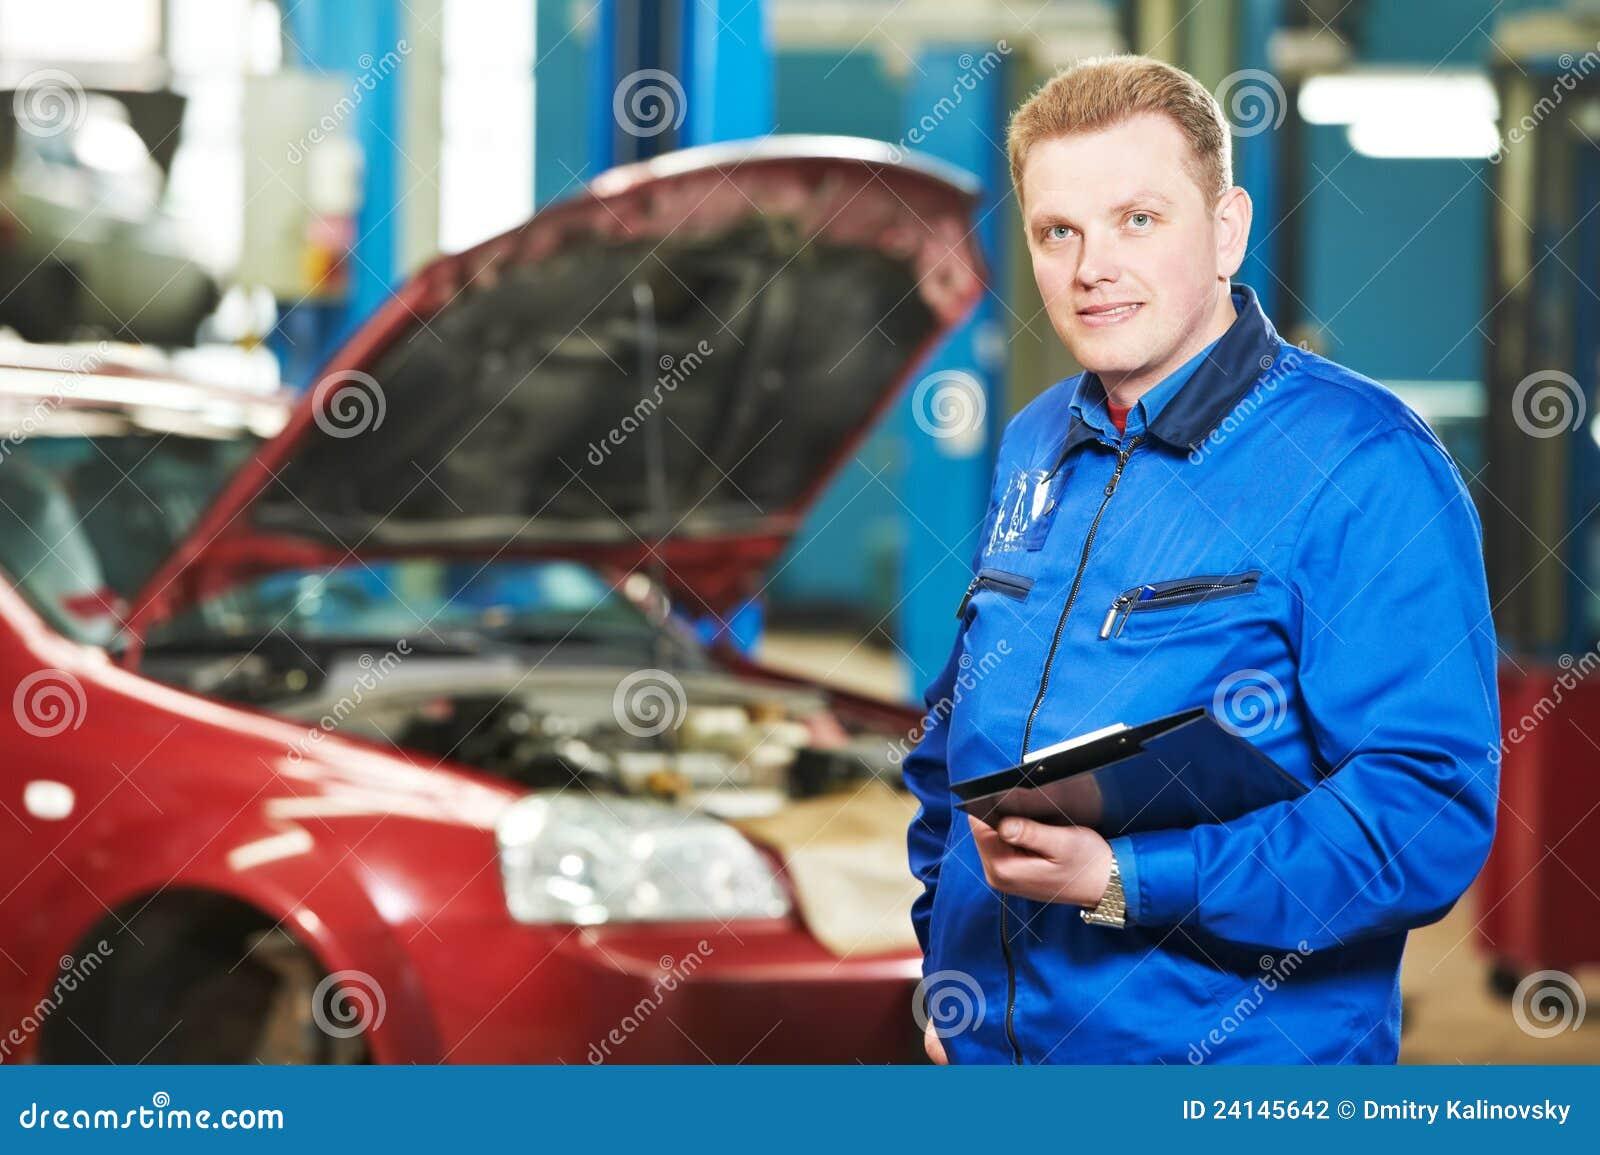 happy maintenance engineers looking away in automobile repair shop royalty free stock image. Black Bedroom Furniture Sets. Home Design Ideas